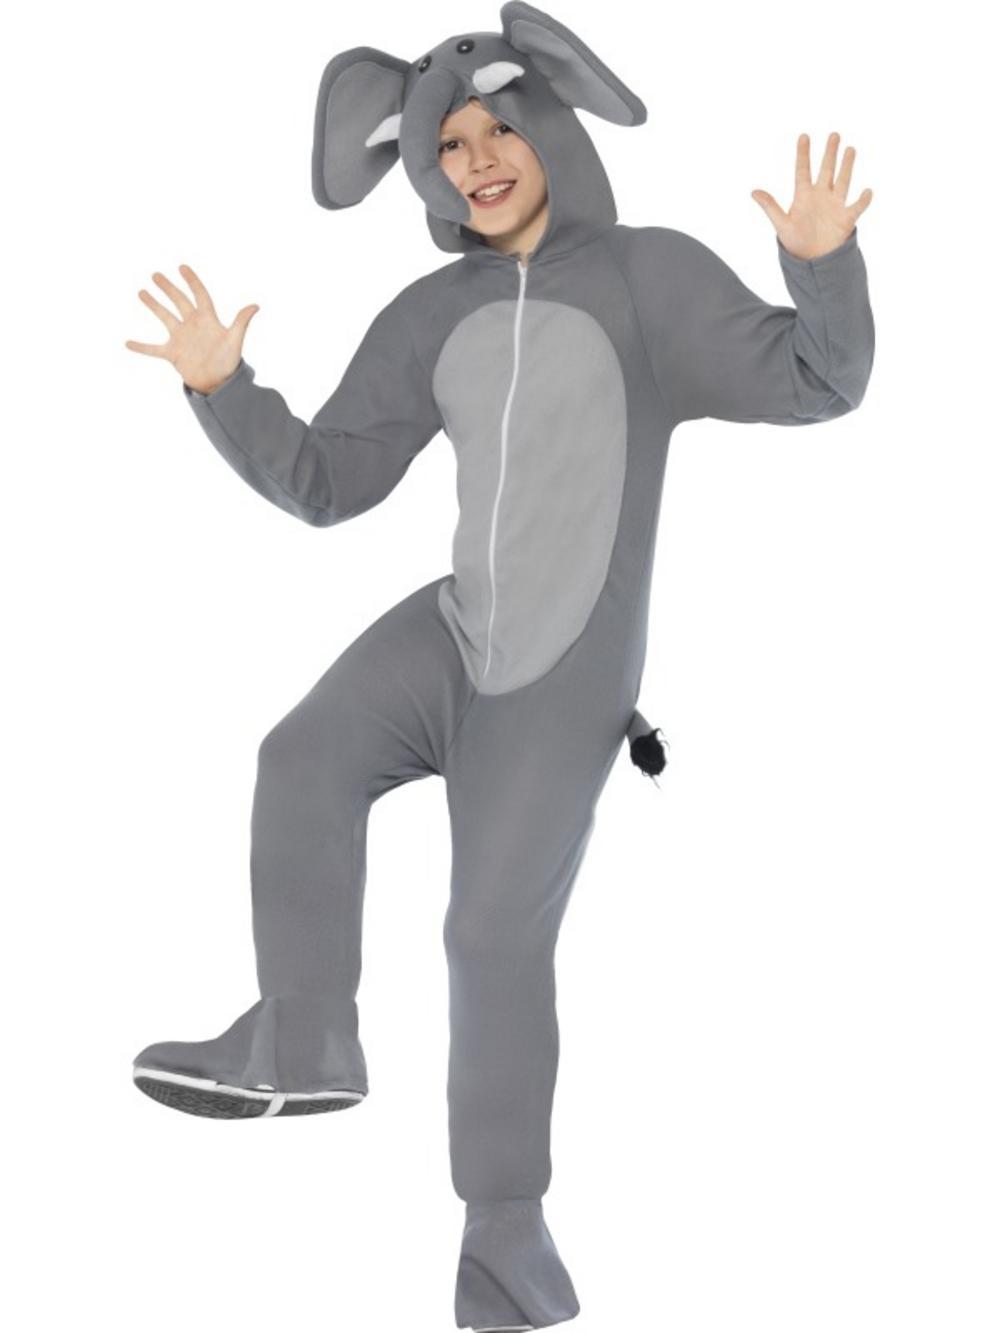 Adult costume dumbo